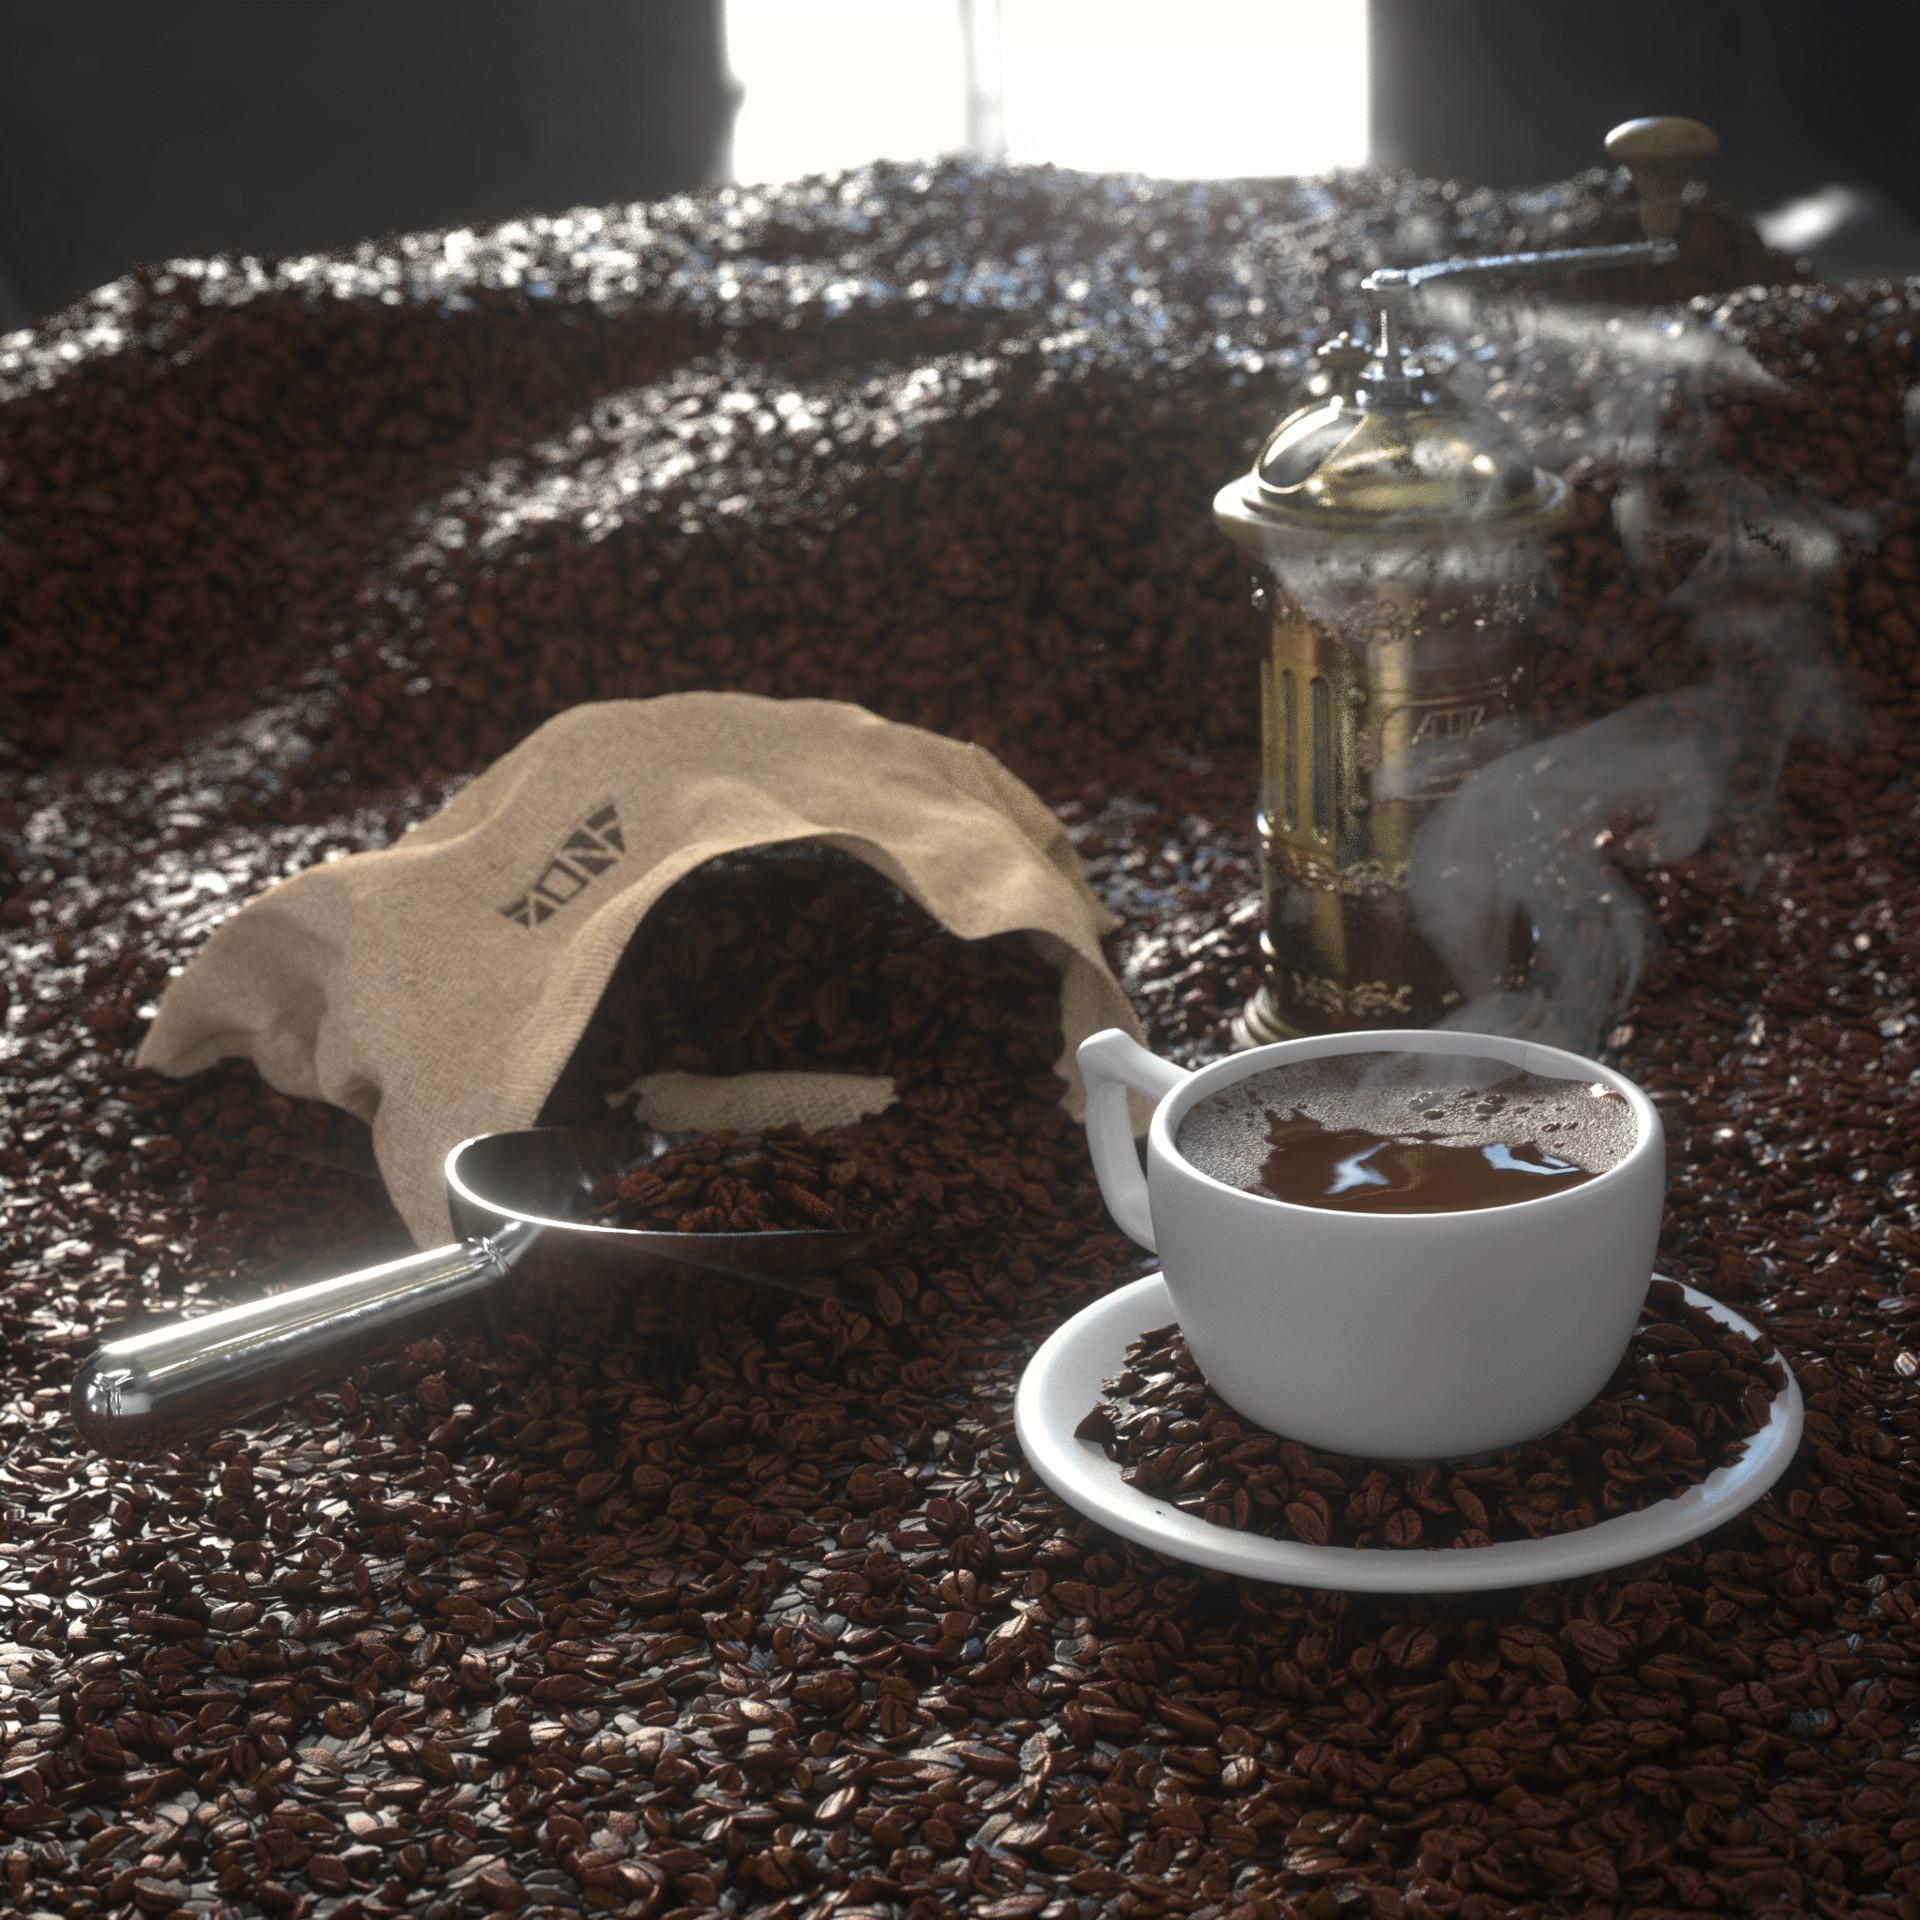 Cem tezcan anova coffee 00000 alt